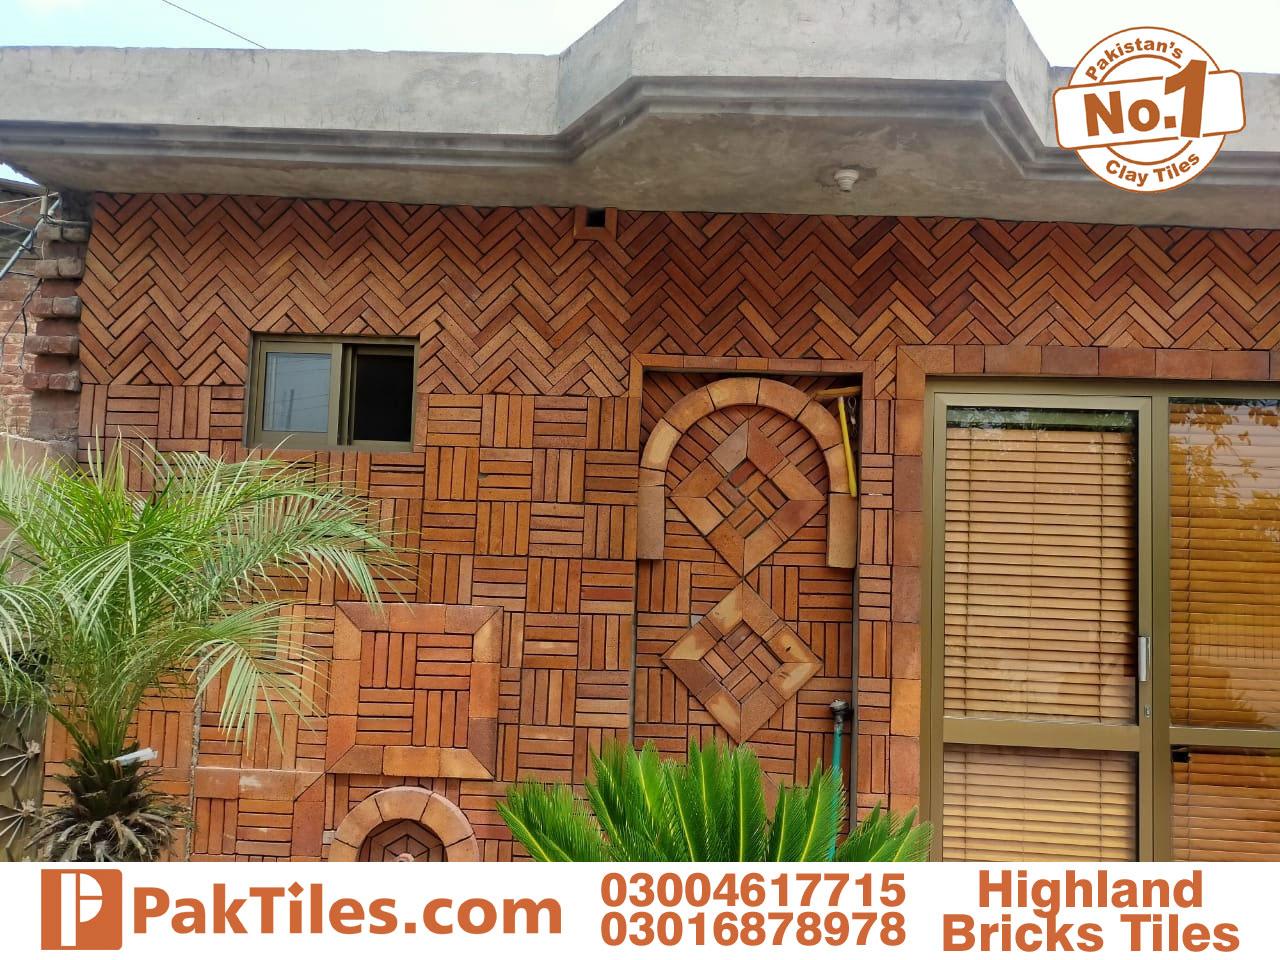 Lahori Yellow Gutka Bricks Font Wall Tiles